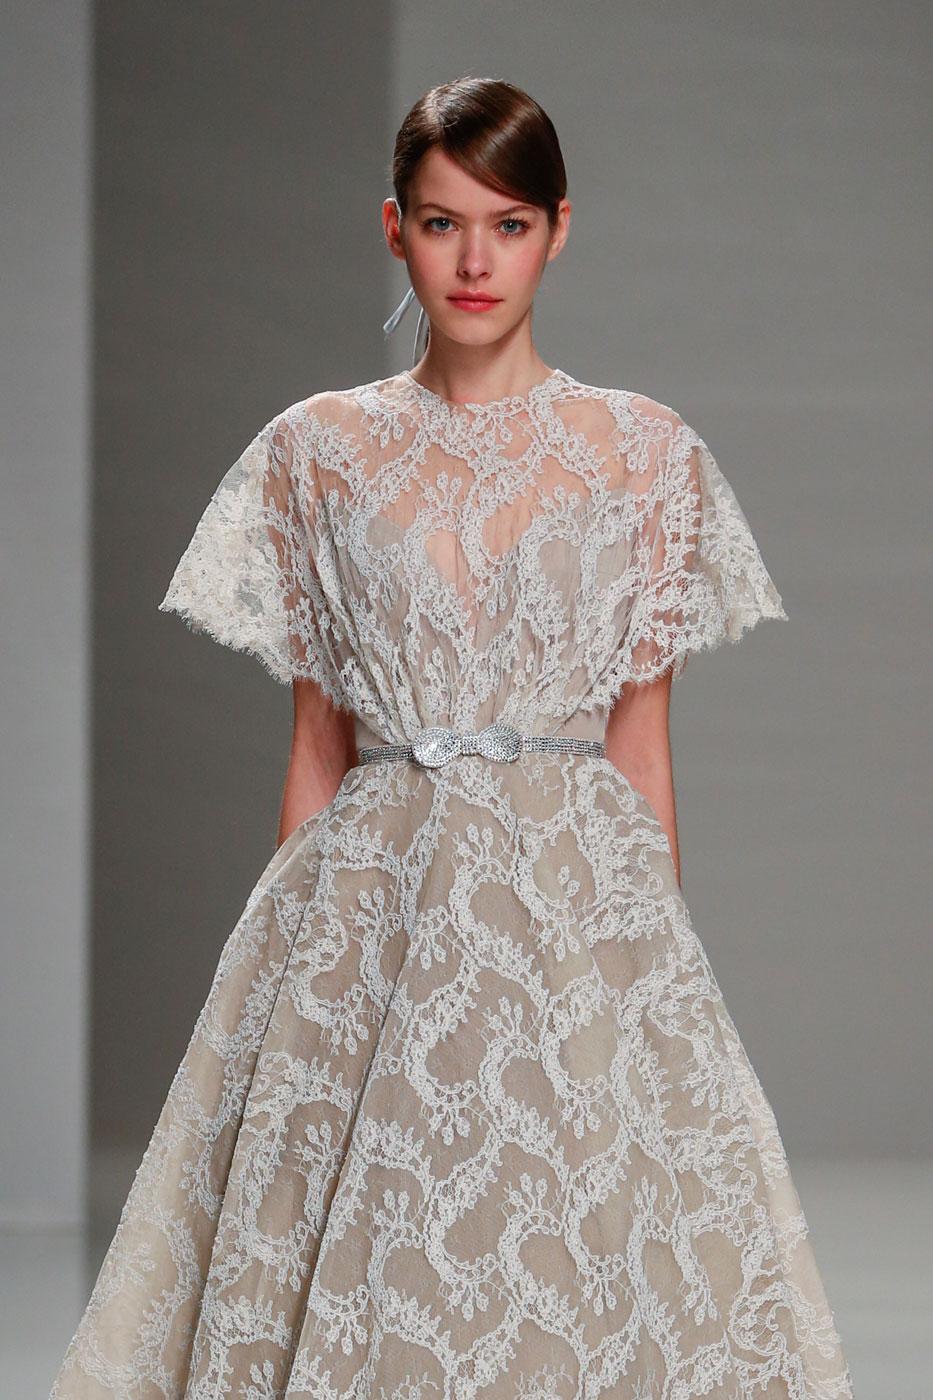 Georges-Hobeika-fashion-runway-show-haute-couture-paris-spring-2015-the-impression-60